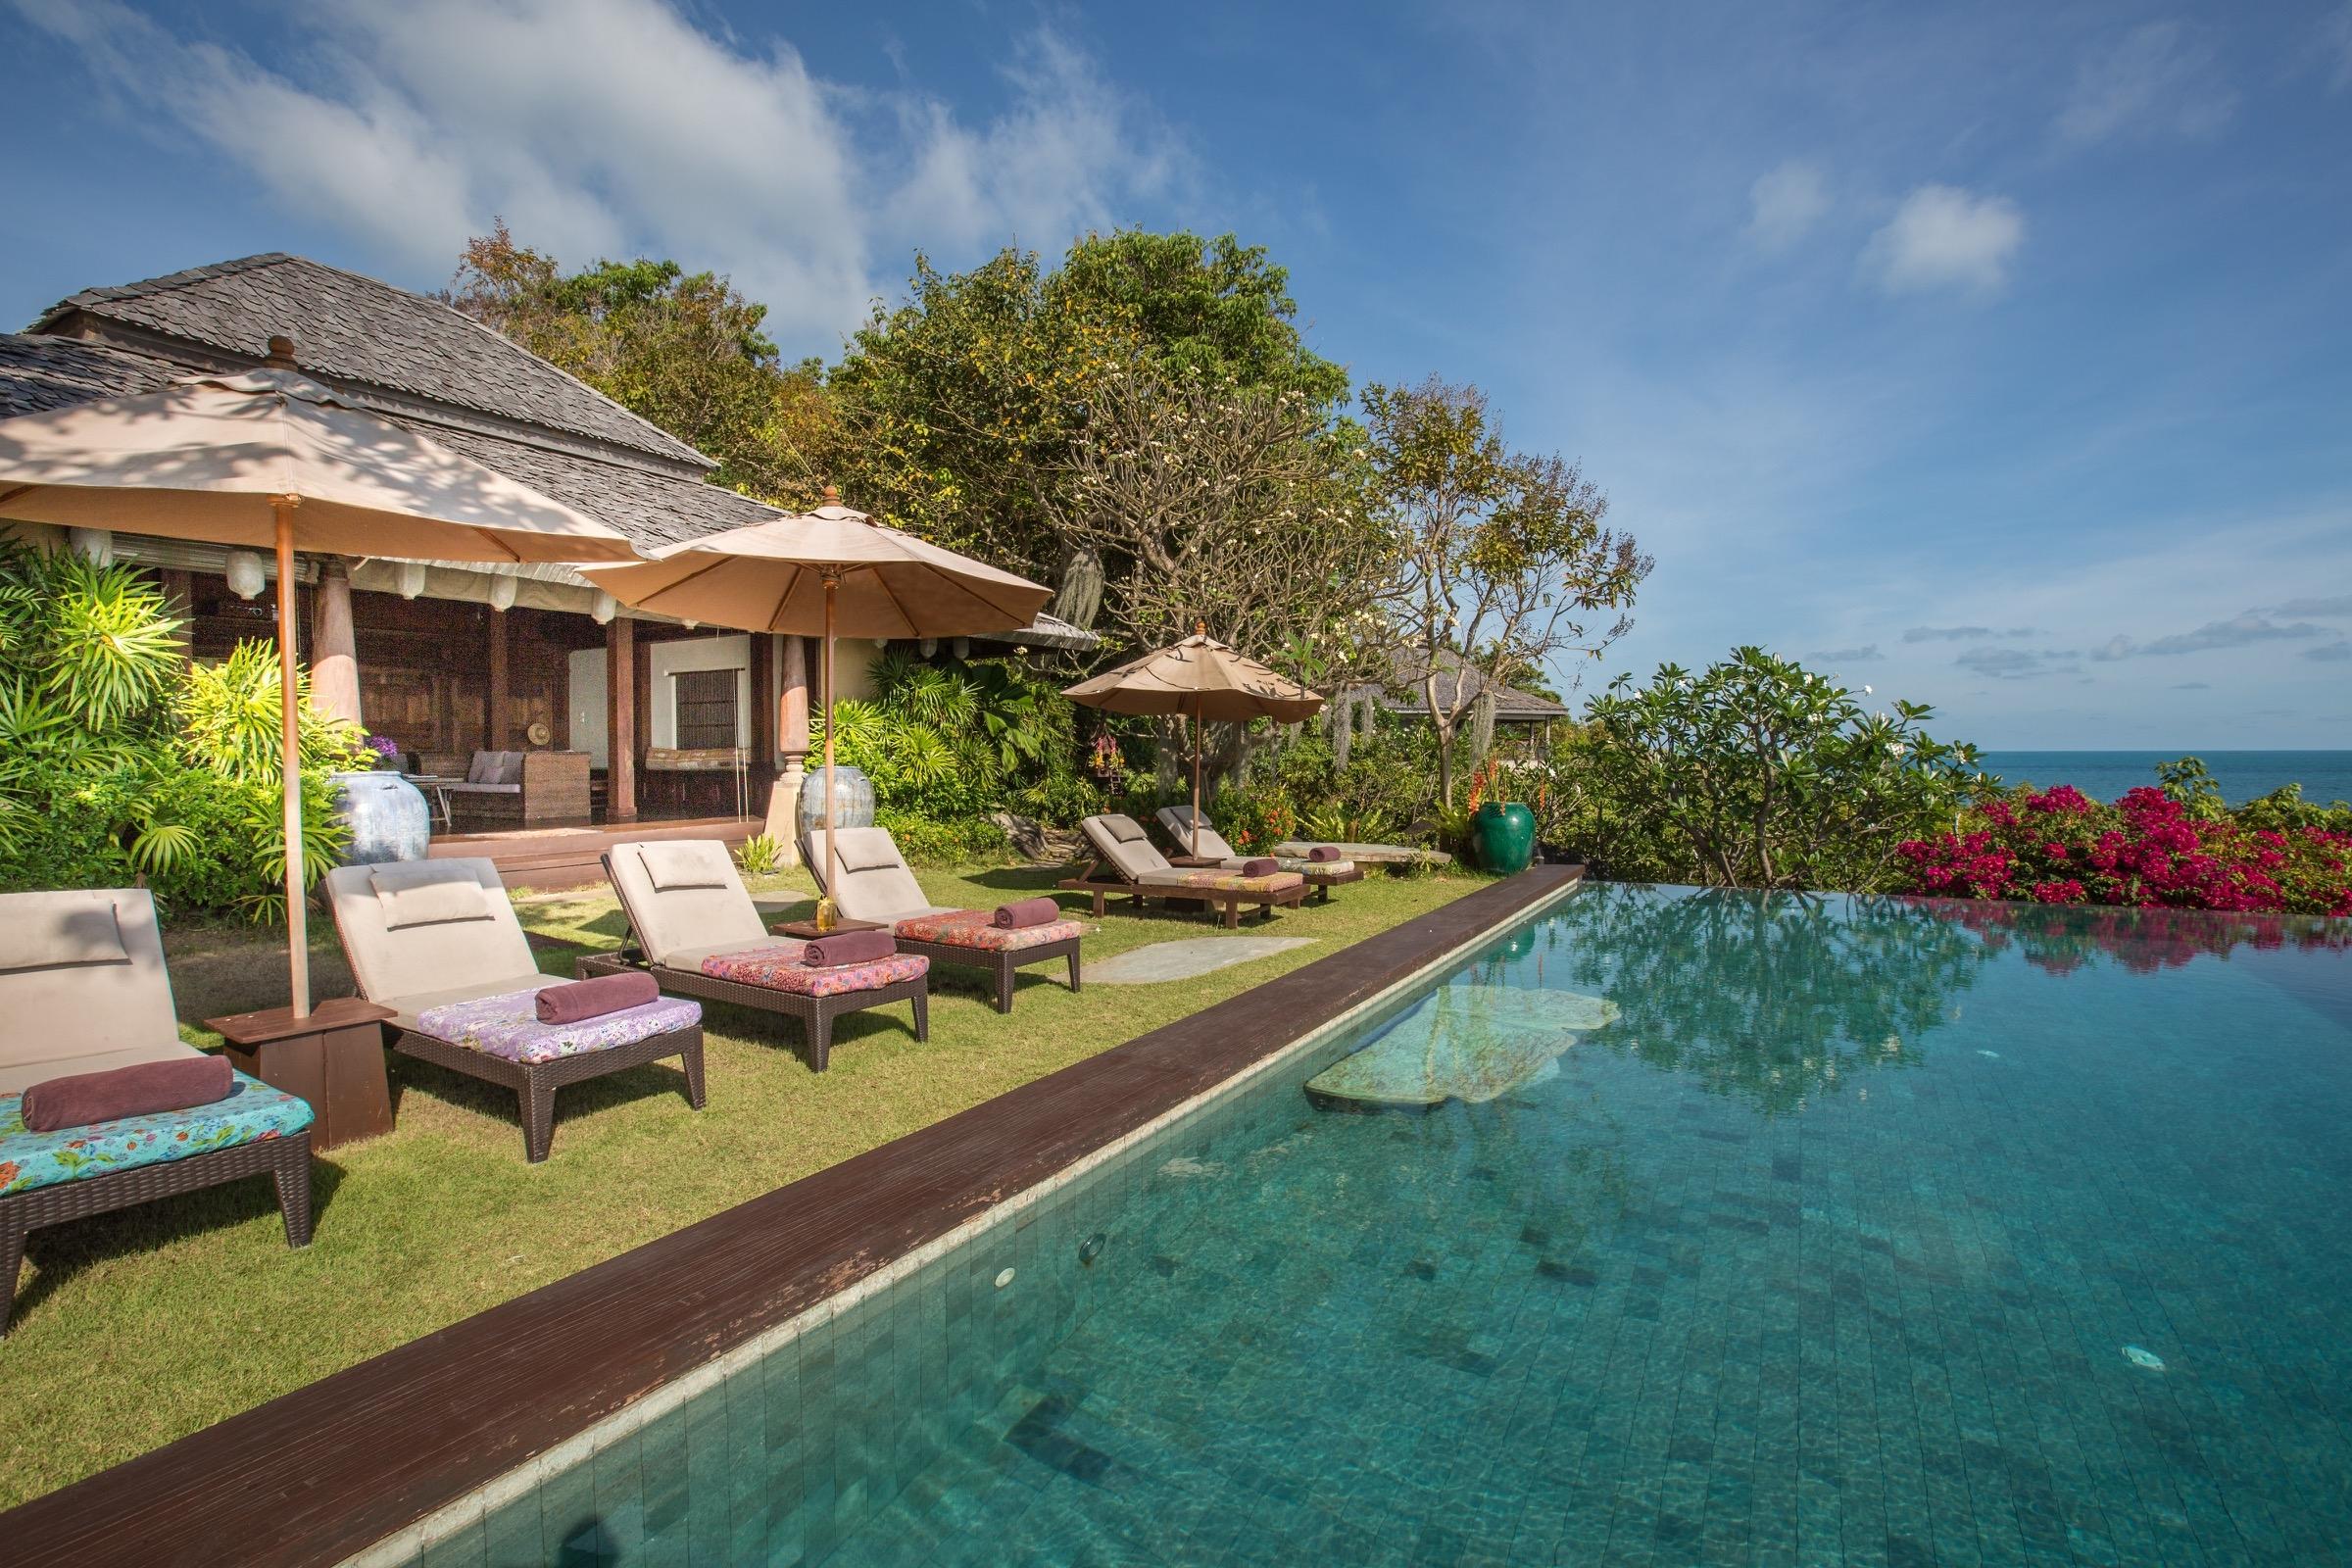 Villa Samudra has a special, authentic design